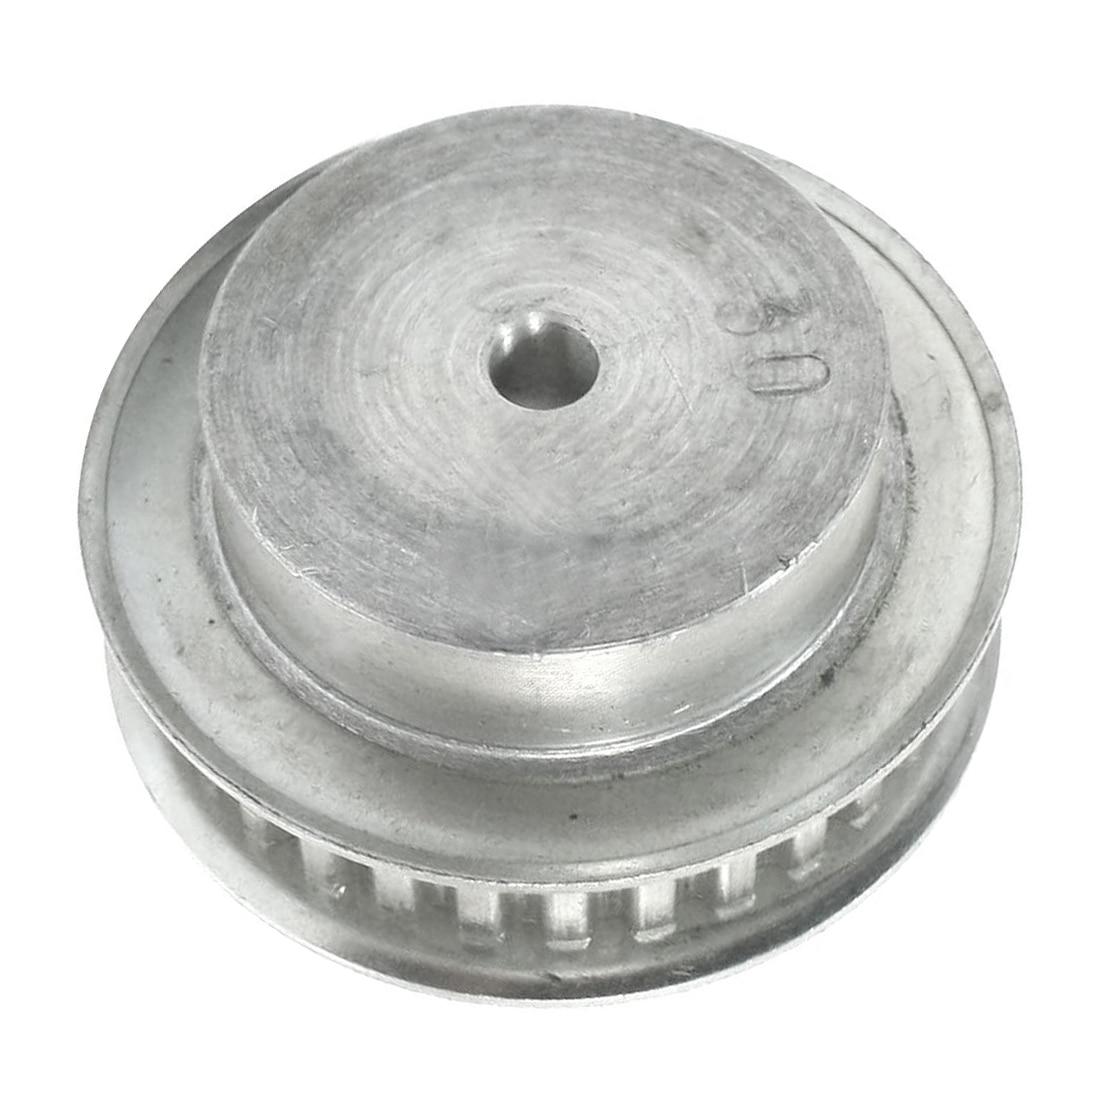 Stepper Motor 30 Zähne 6mm Bohrung XL Typ Aluminium Zahnriemenscheibe